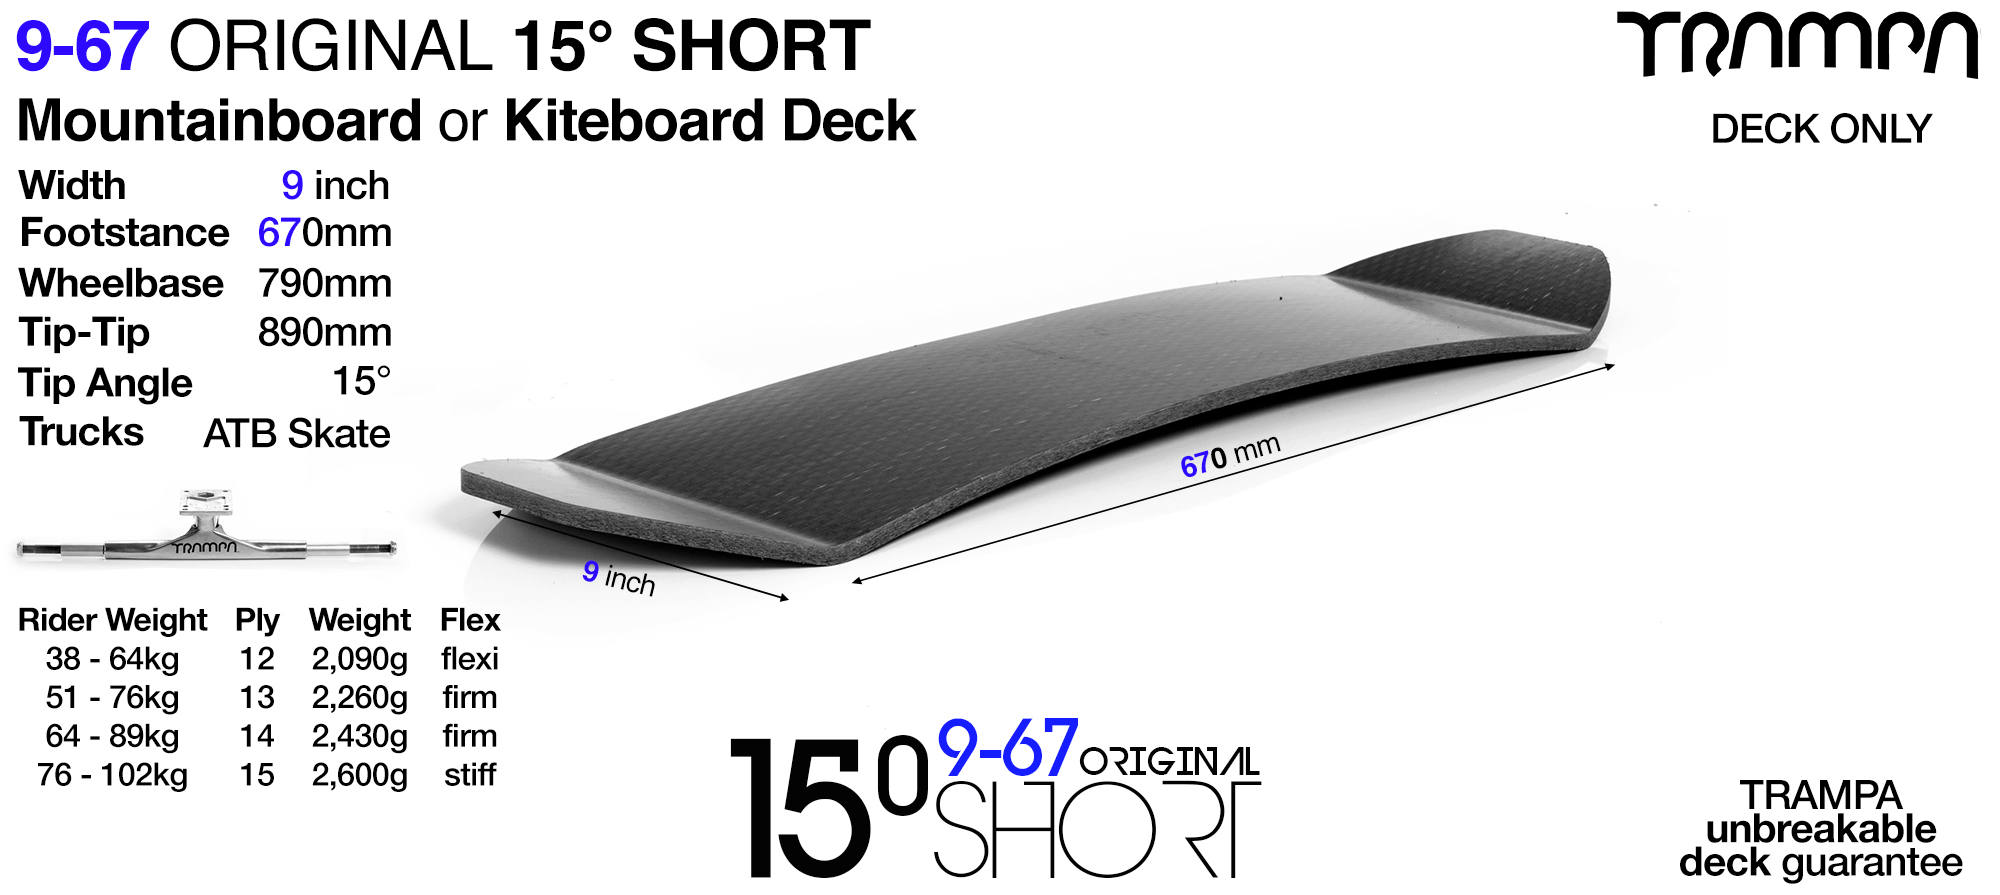 15° Short BLANK TRAMPA Deck